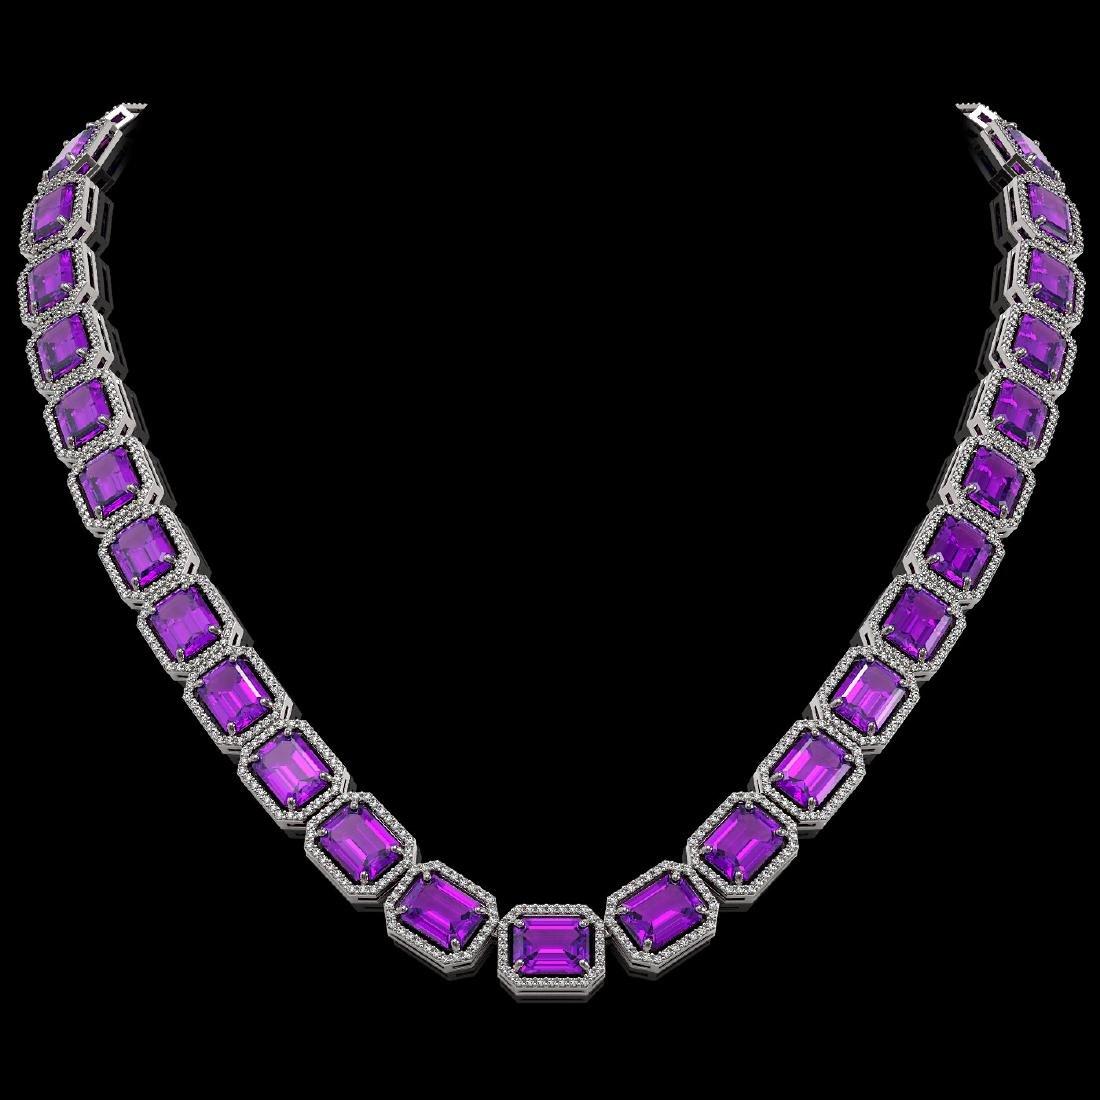 76.69 CTW Amethyst & Diamond Halo Necklace 10K White